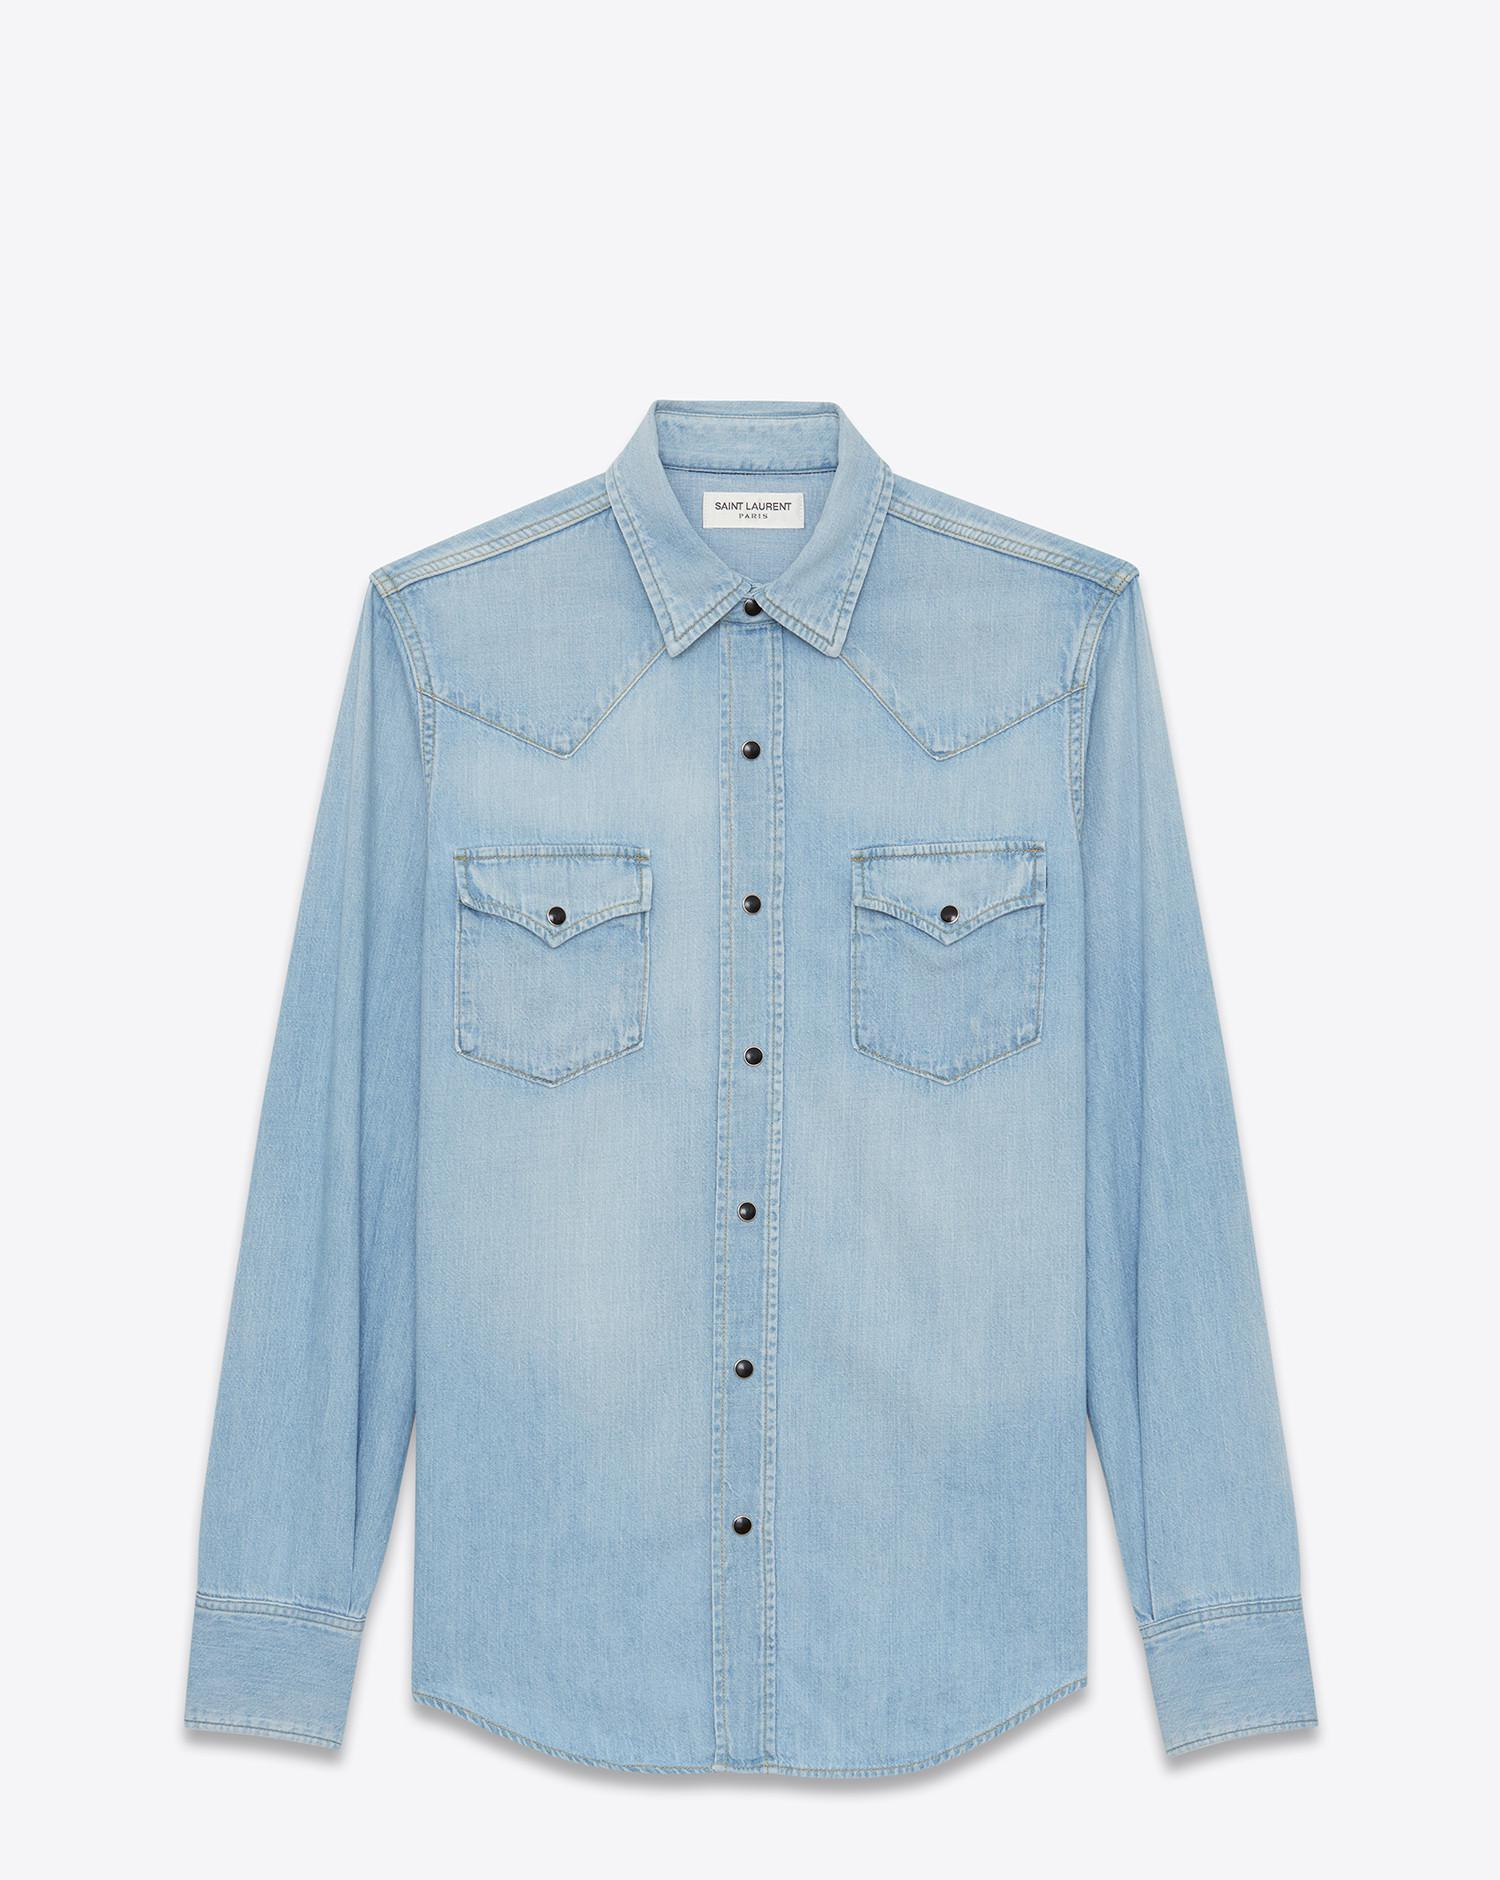 522b71473d Saint Laurent - Blue Western Shirts for Men - Lyst. View fullscreen